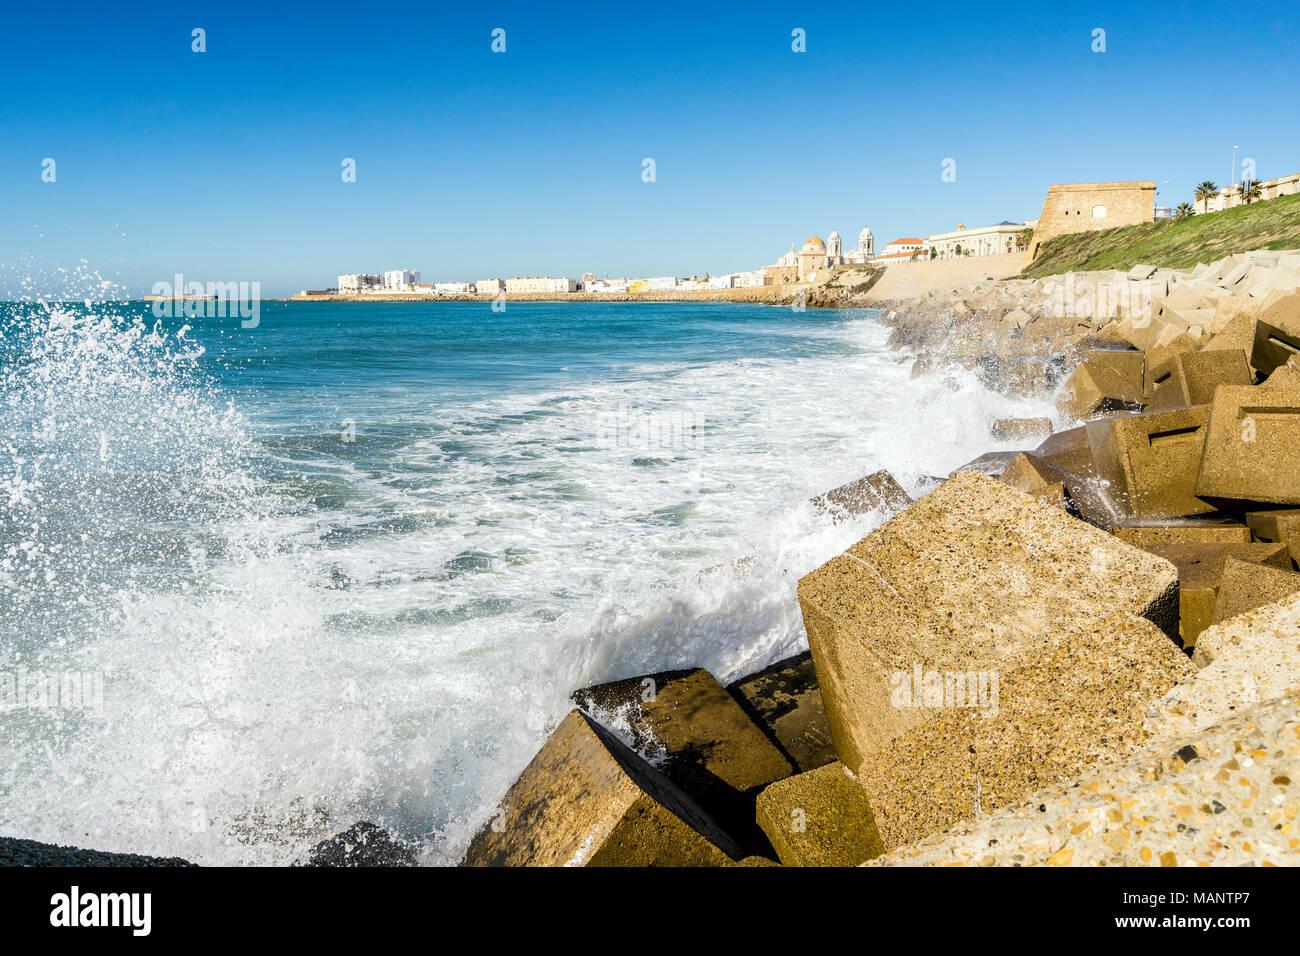 Atlantic waves breaking on the urbanized shore of old Cadiz, Andalusia, Spain - Stock Image